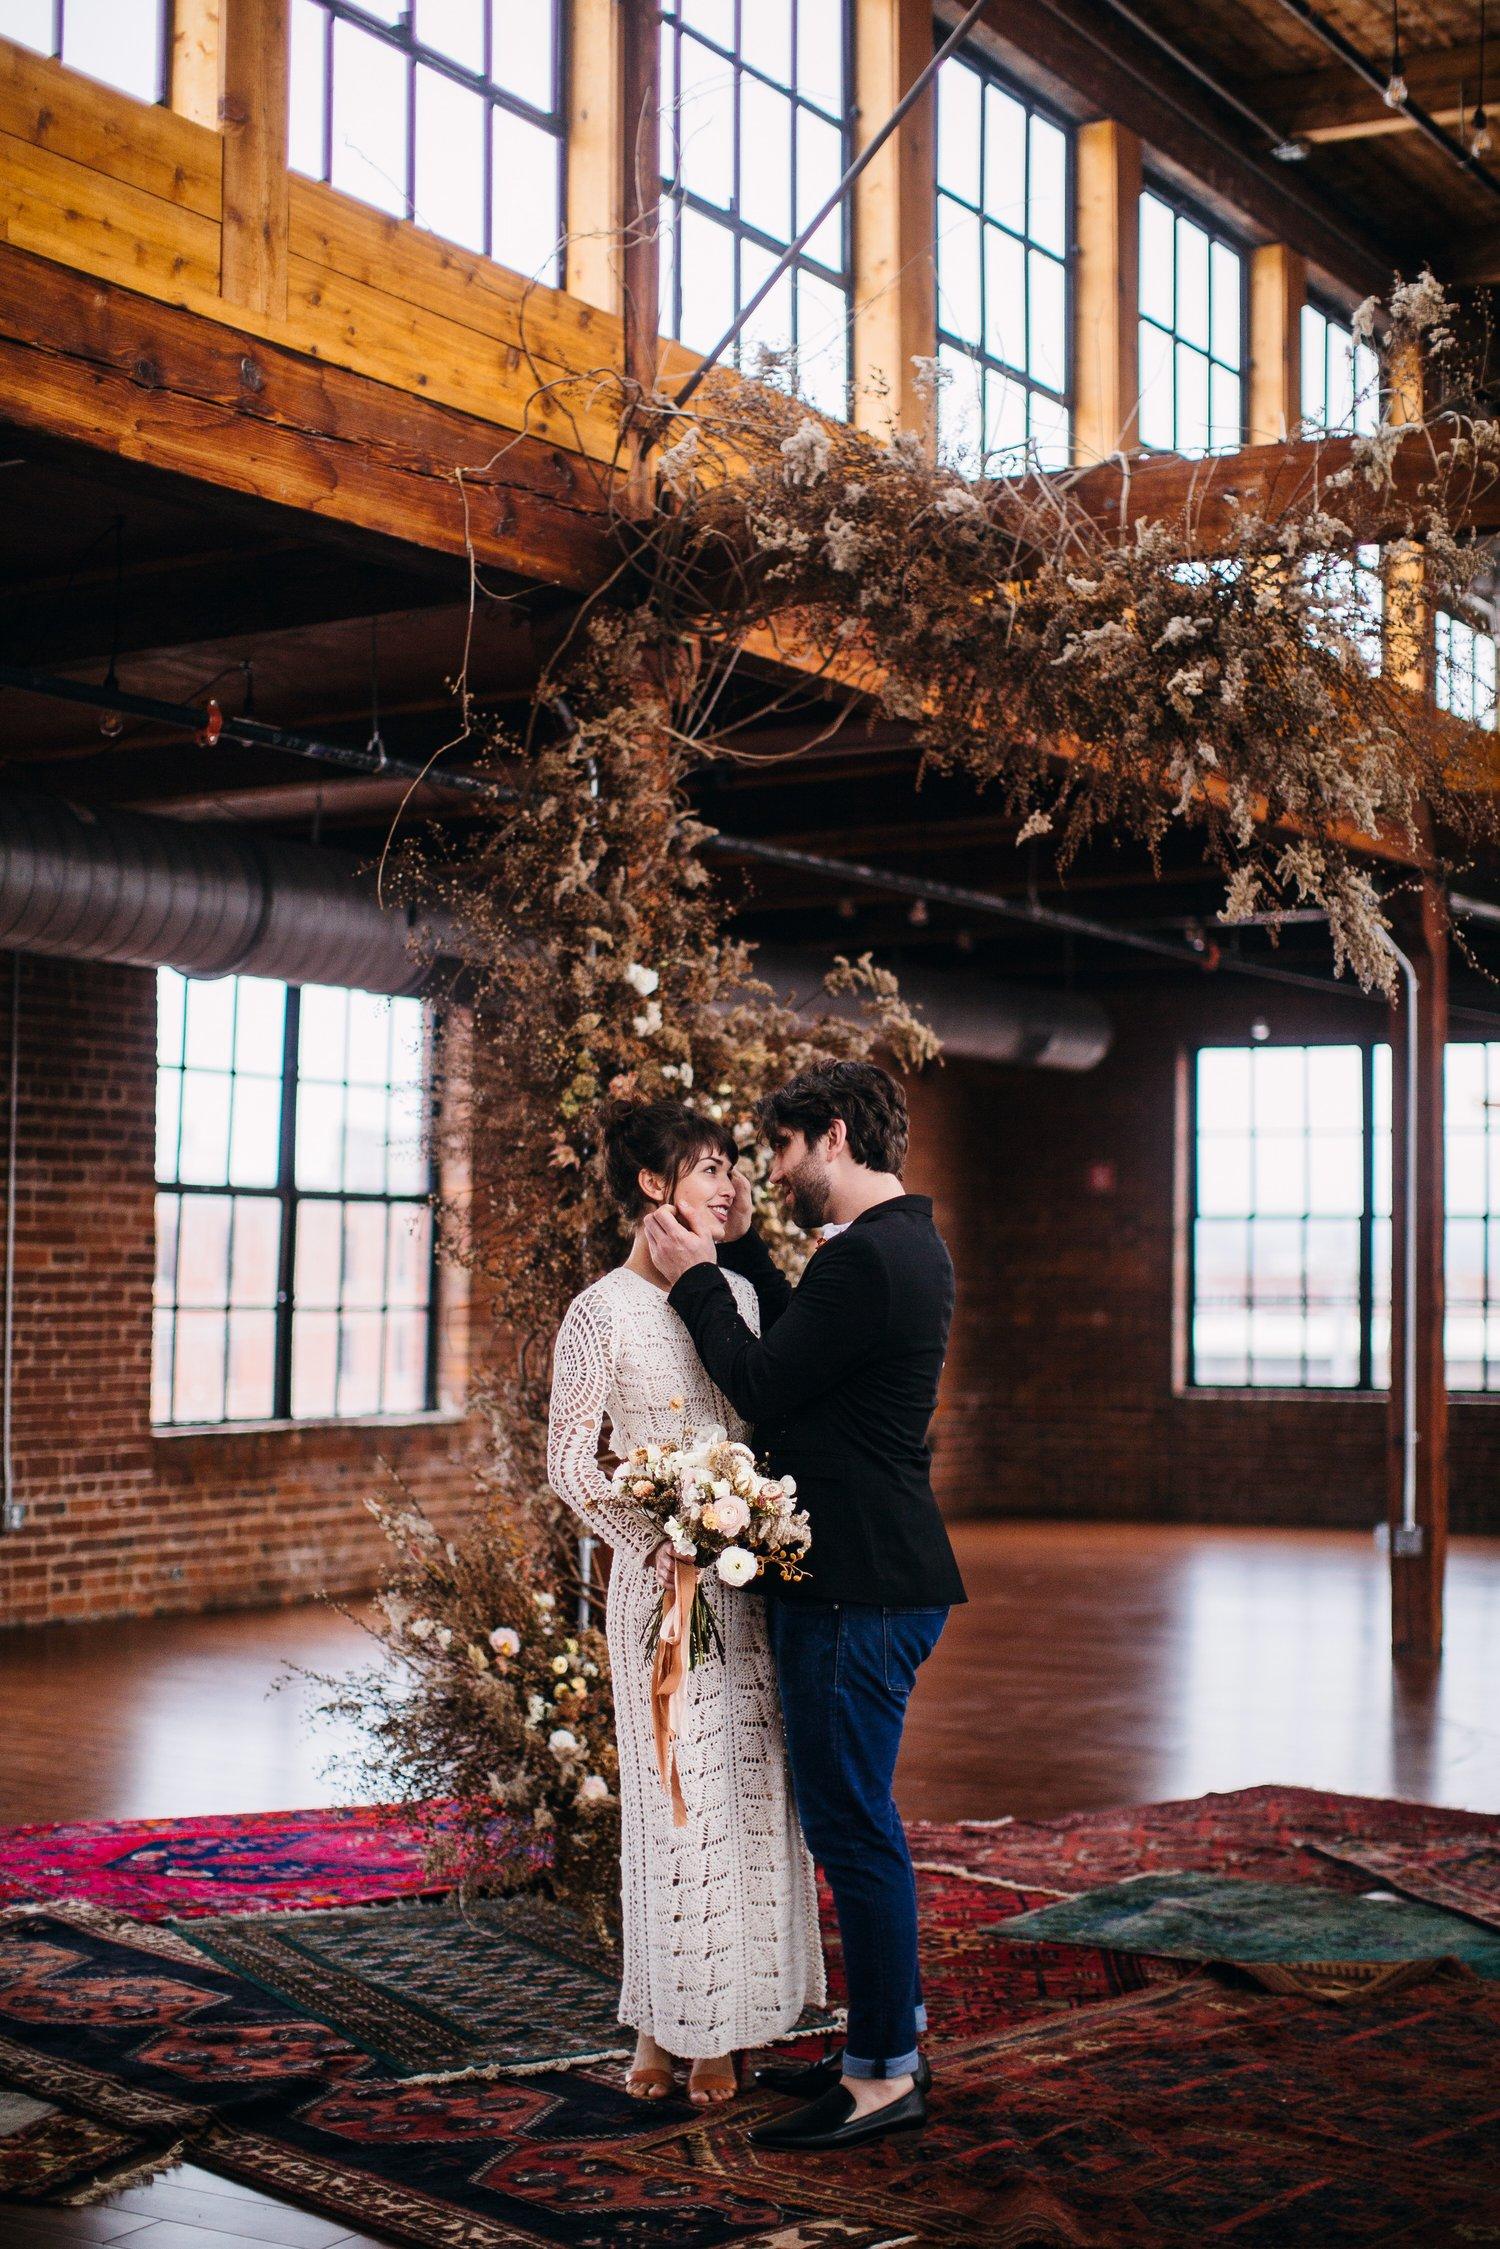 wedding-venue-near-me (4).jpeg